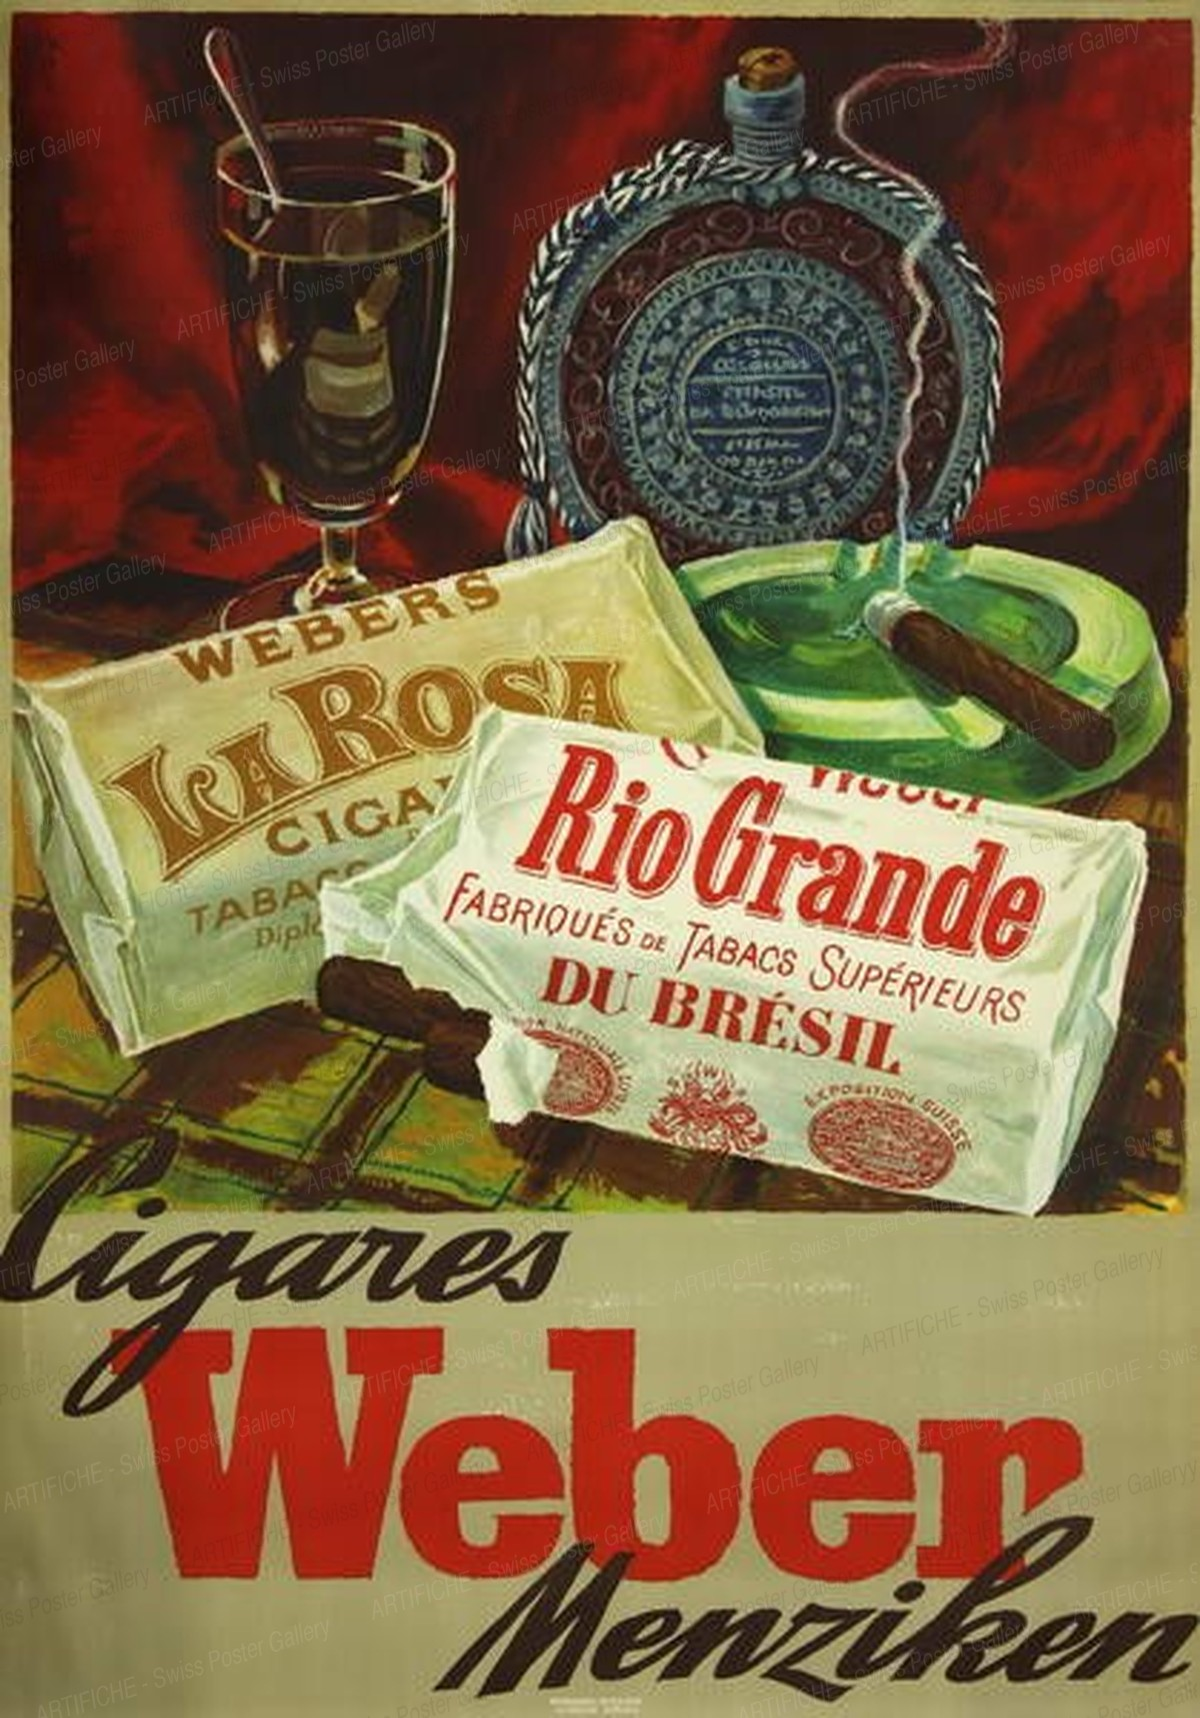 Cigares Weber – Rio Grande, Alfred Koella